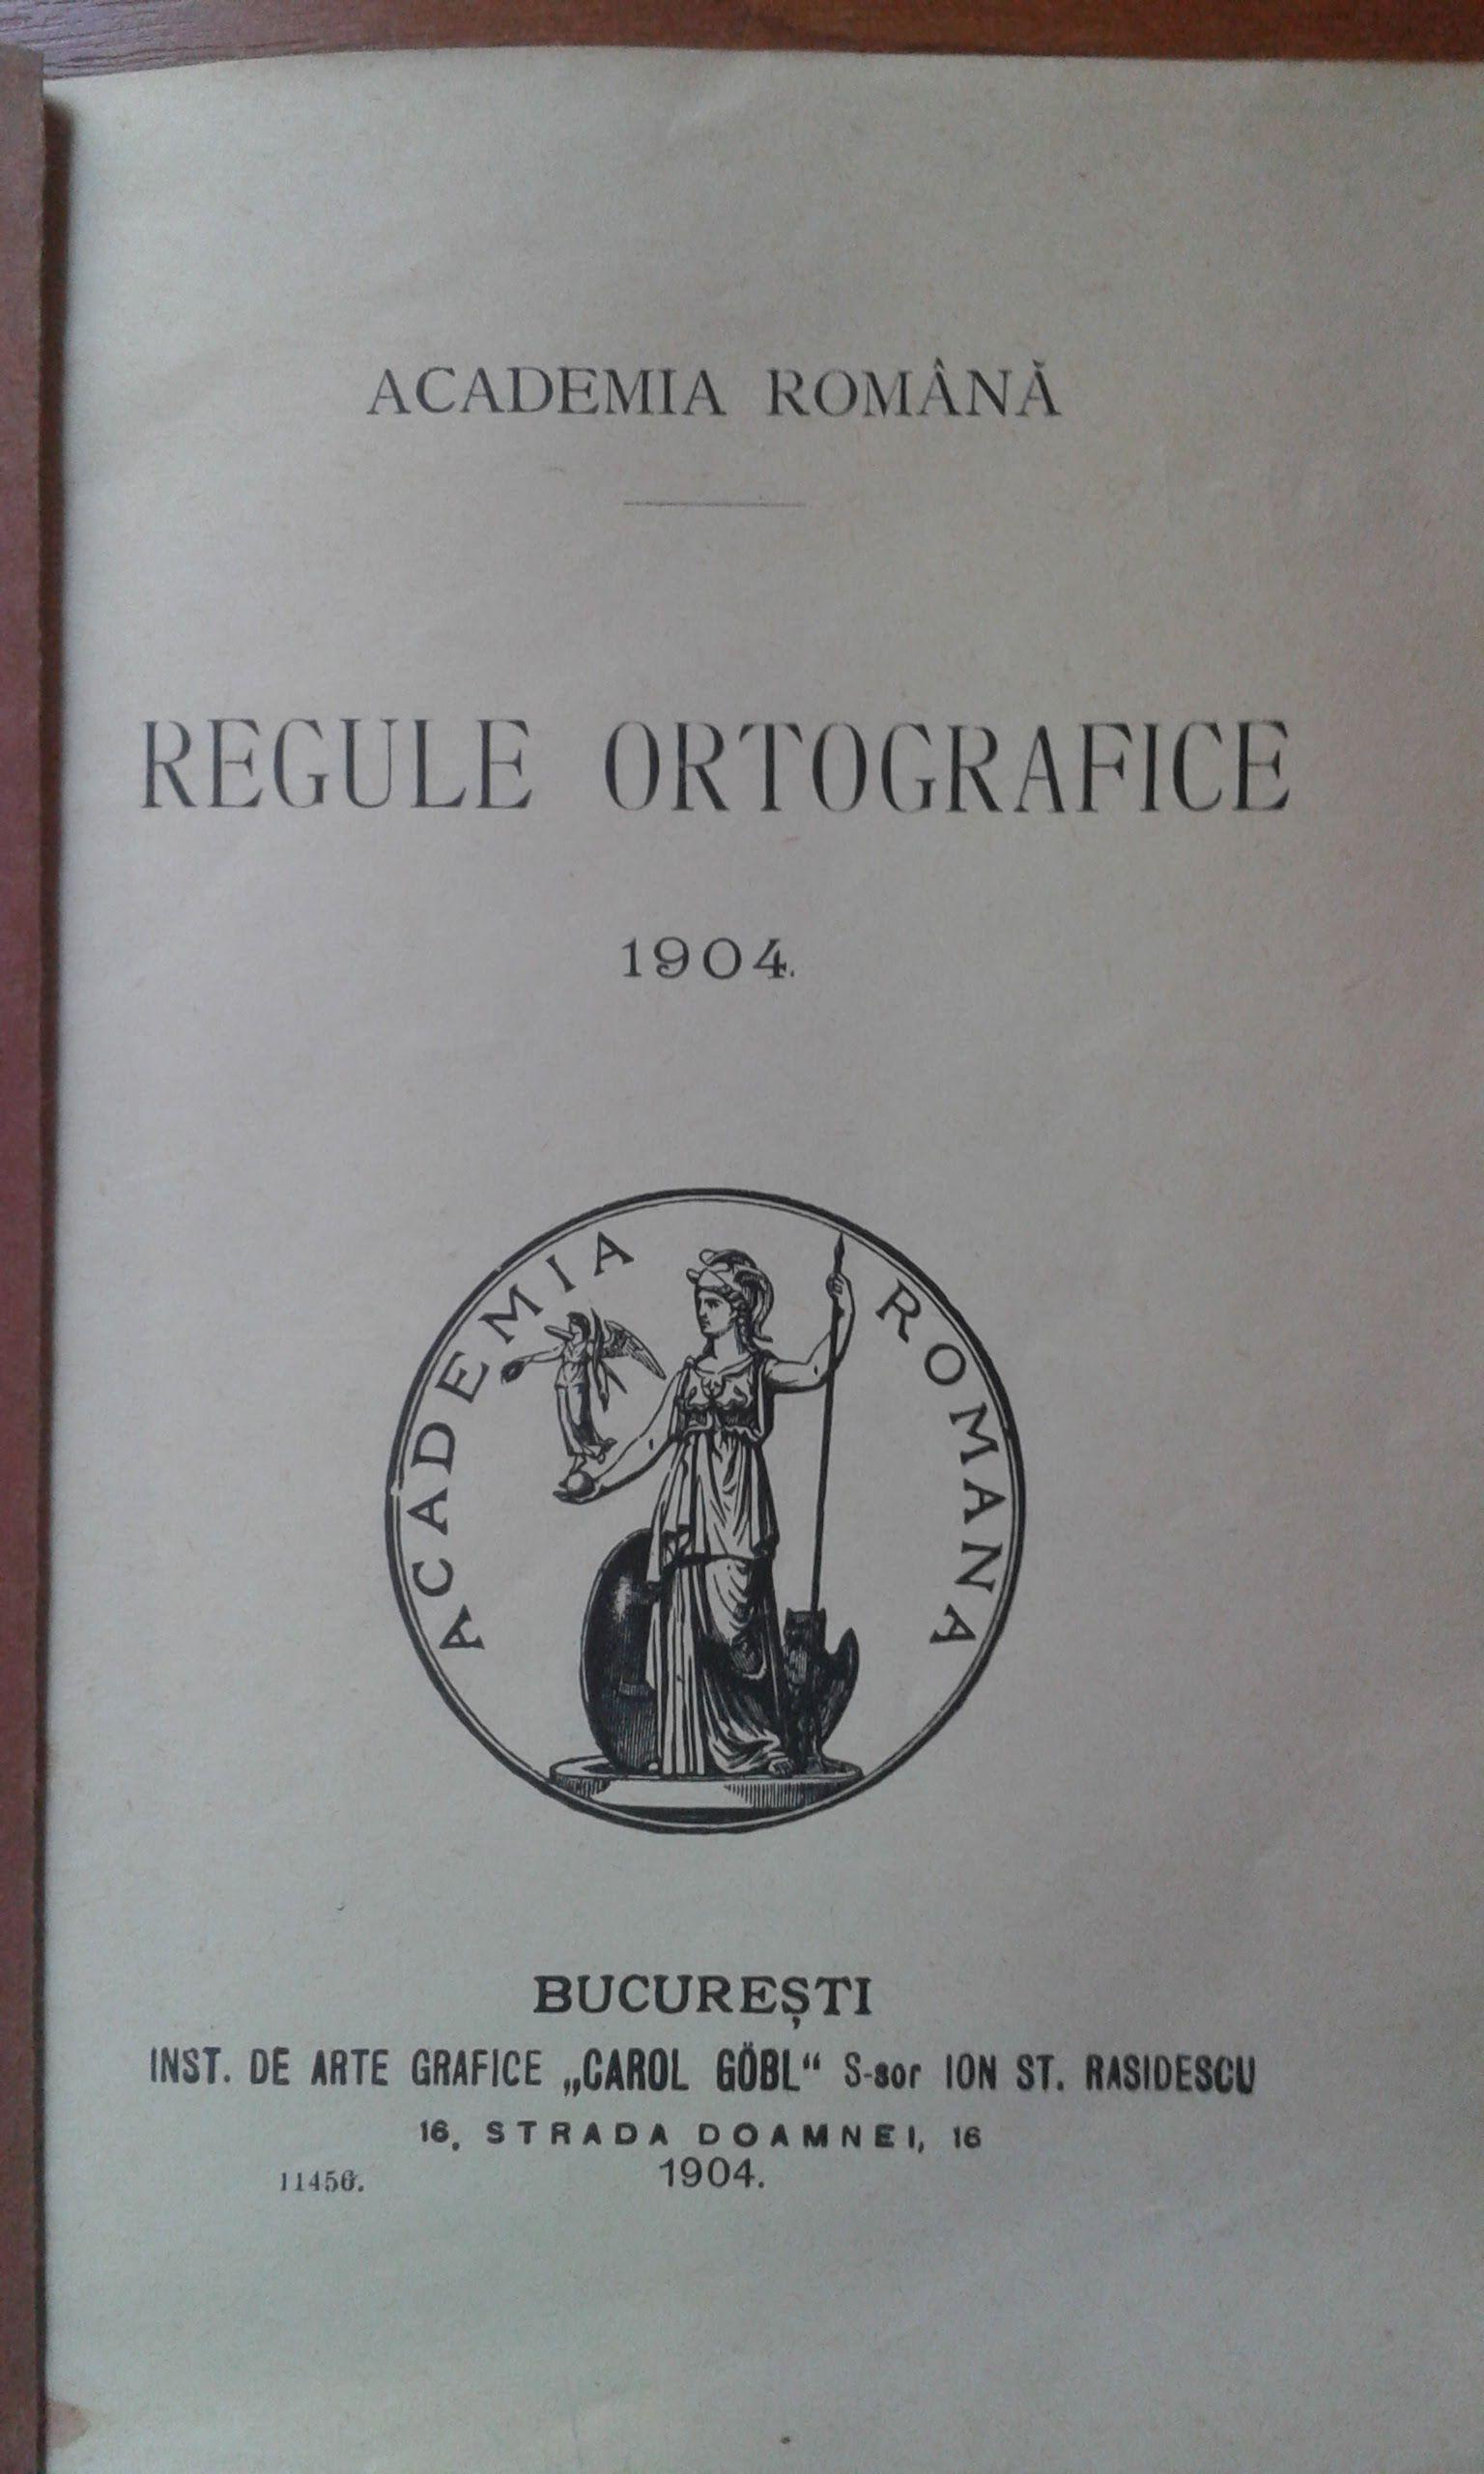 1904 - Regule ortografice (2).jpg